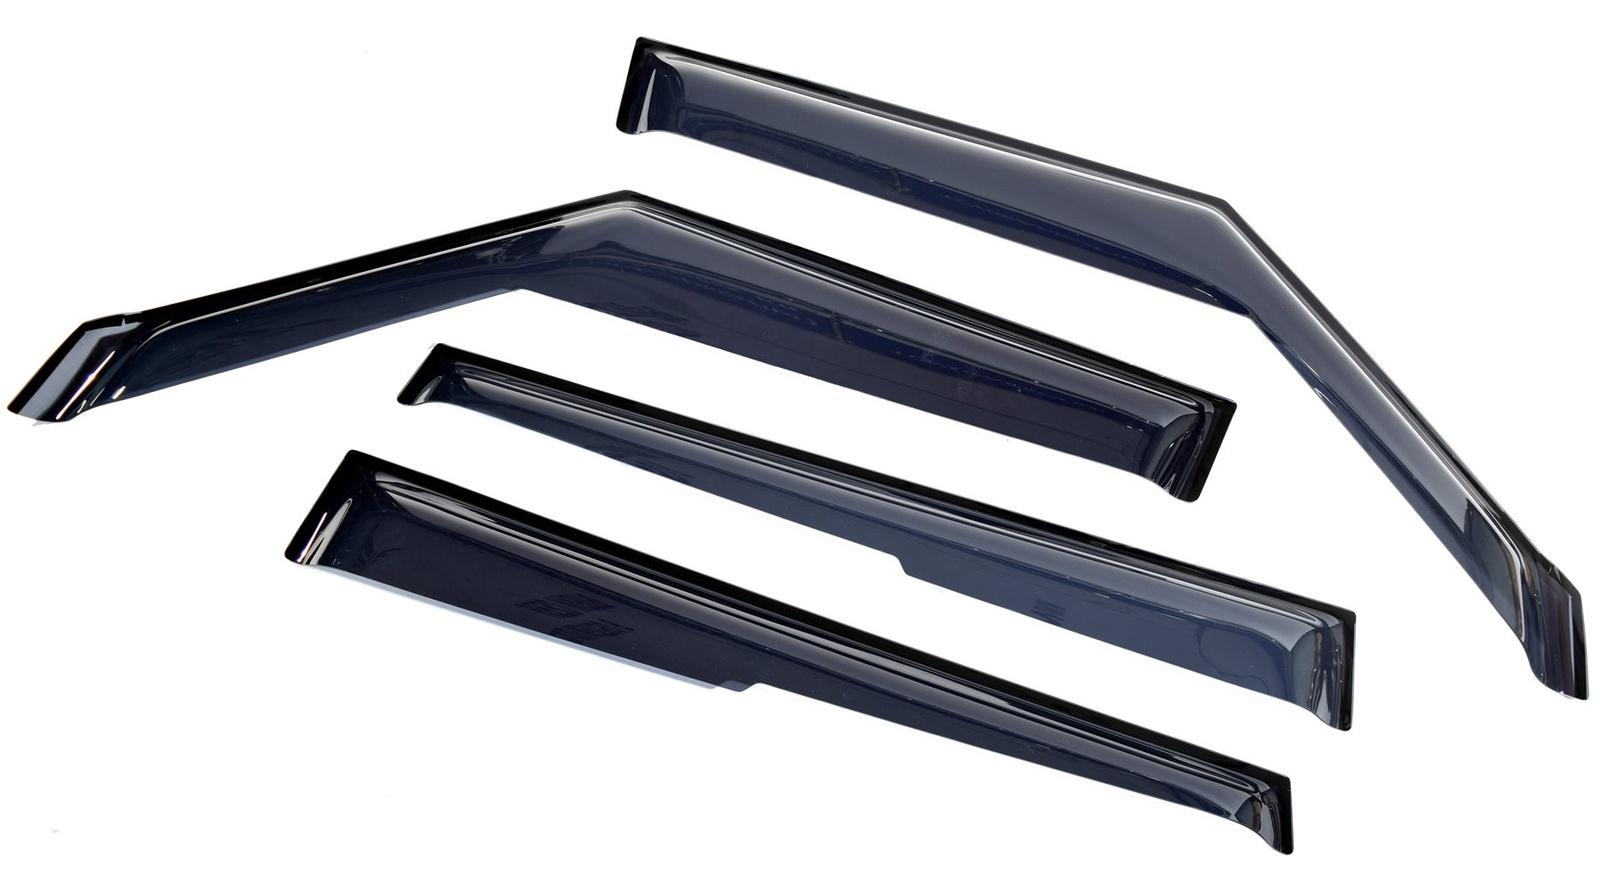 цена на Ветровик SIM Дефлекторы боковых окон Kia Soul (Киа Соул) (2009-2014) (4шт.) (темн)